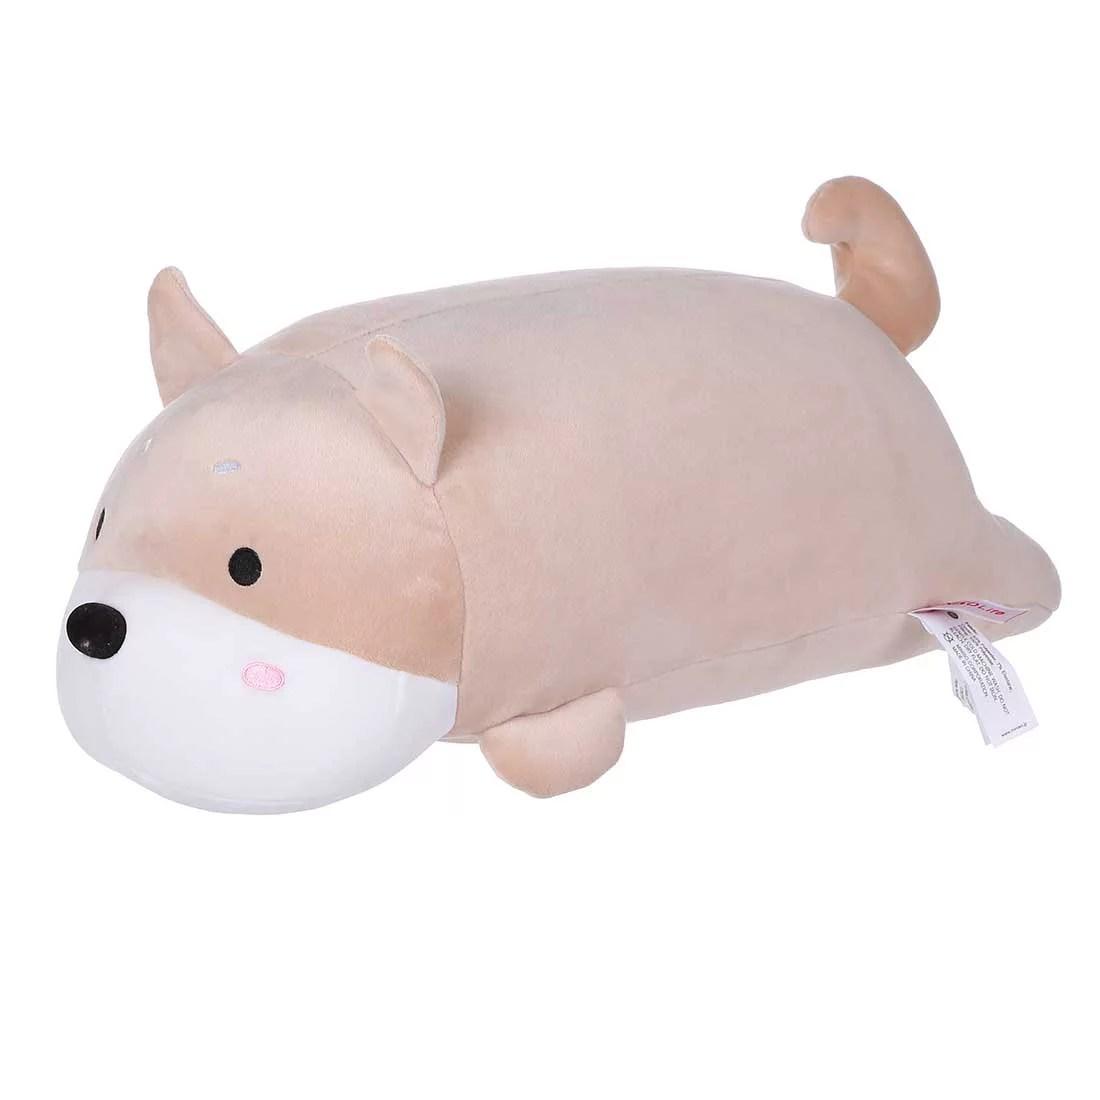 miniso shiba inu dog plush toy pillow cute stuffed doll gift for boy girl kids 13 khaki